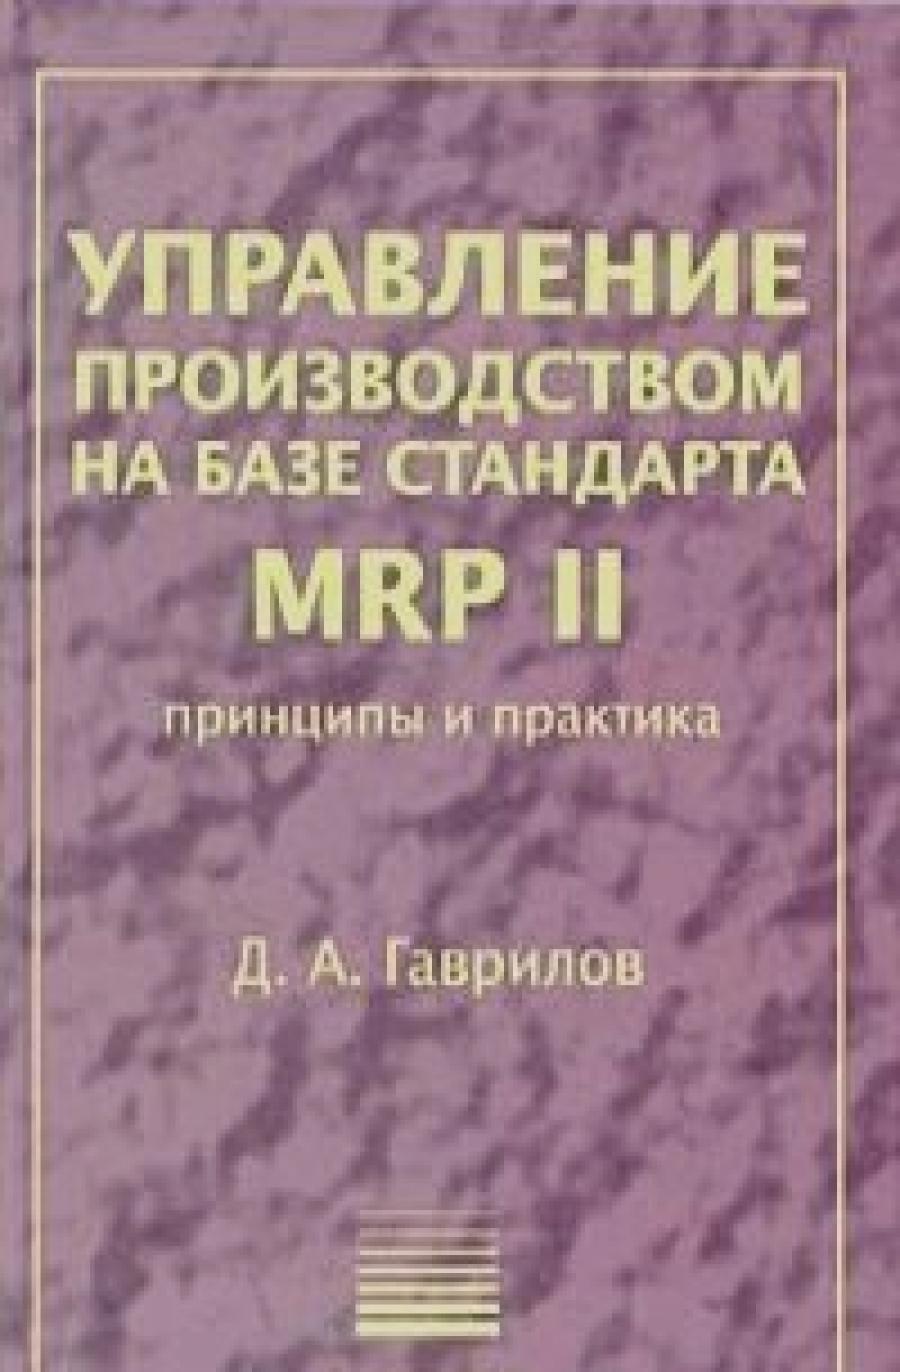 Обложка книги:  теория и практика менеджмента - гаврилов д. а. - управл. пр-вом на базе стандарта mrp ii